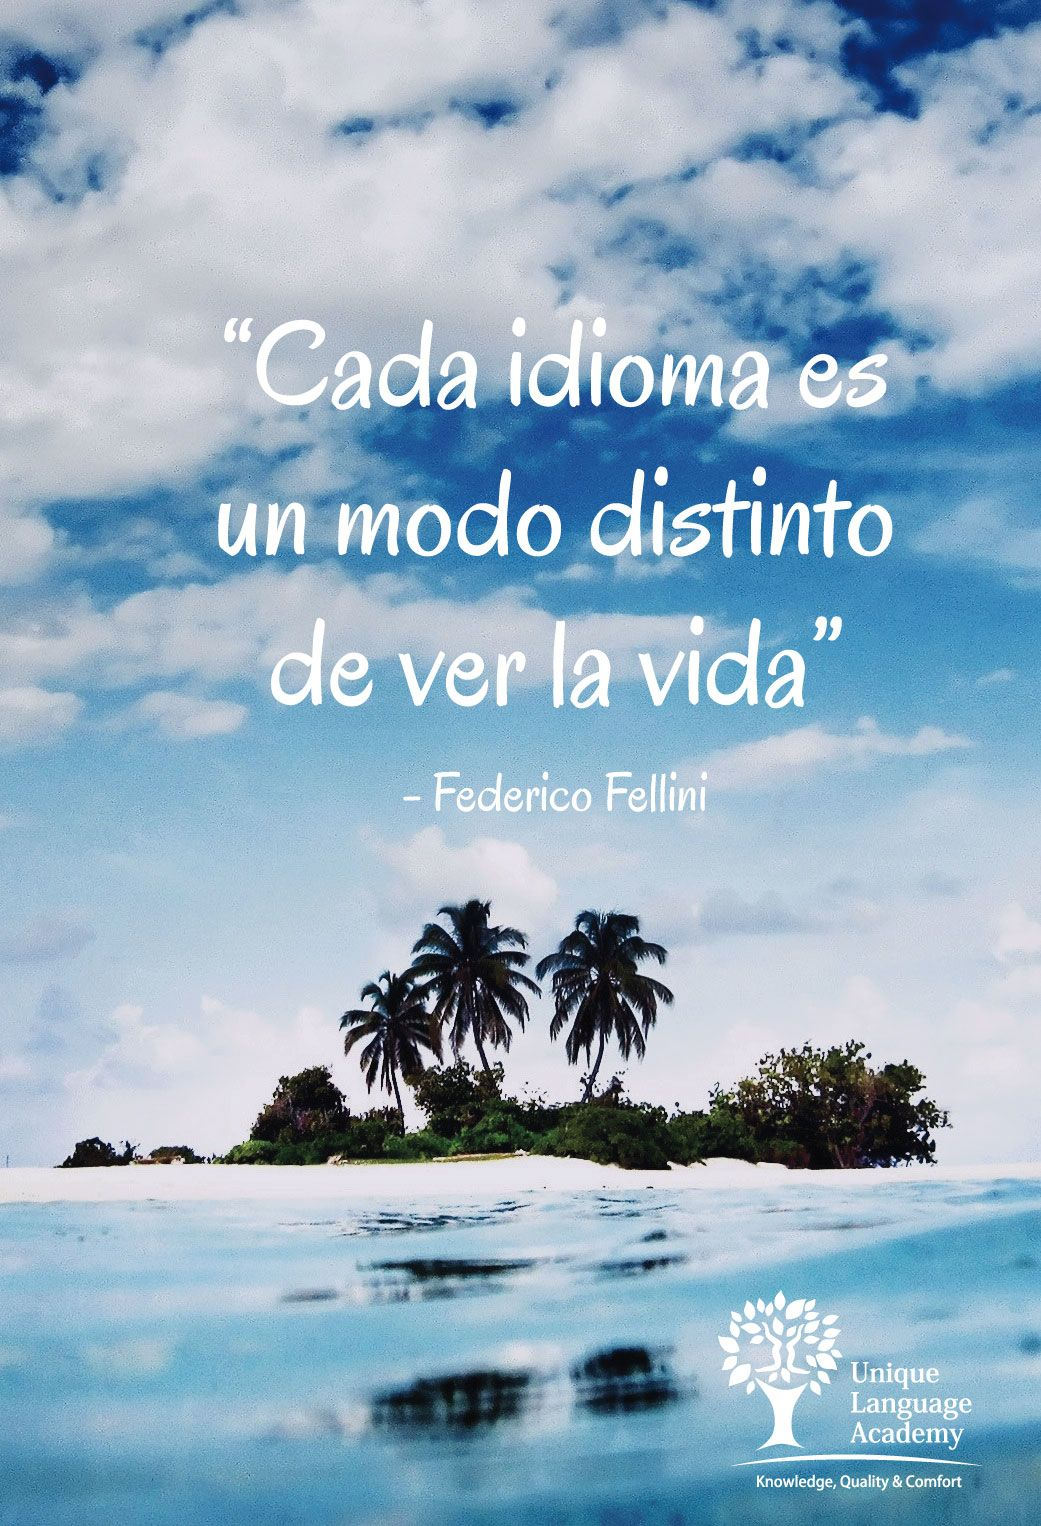 Federico Fellini Quote   Cada idioma es un modo distinto de ver la